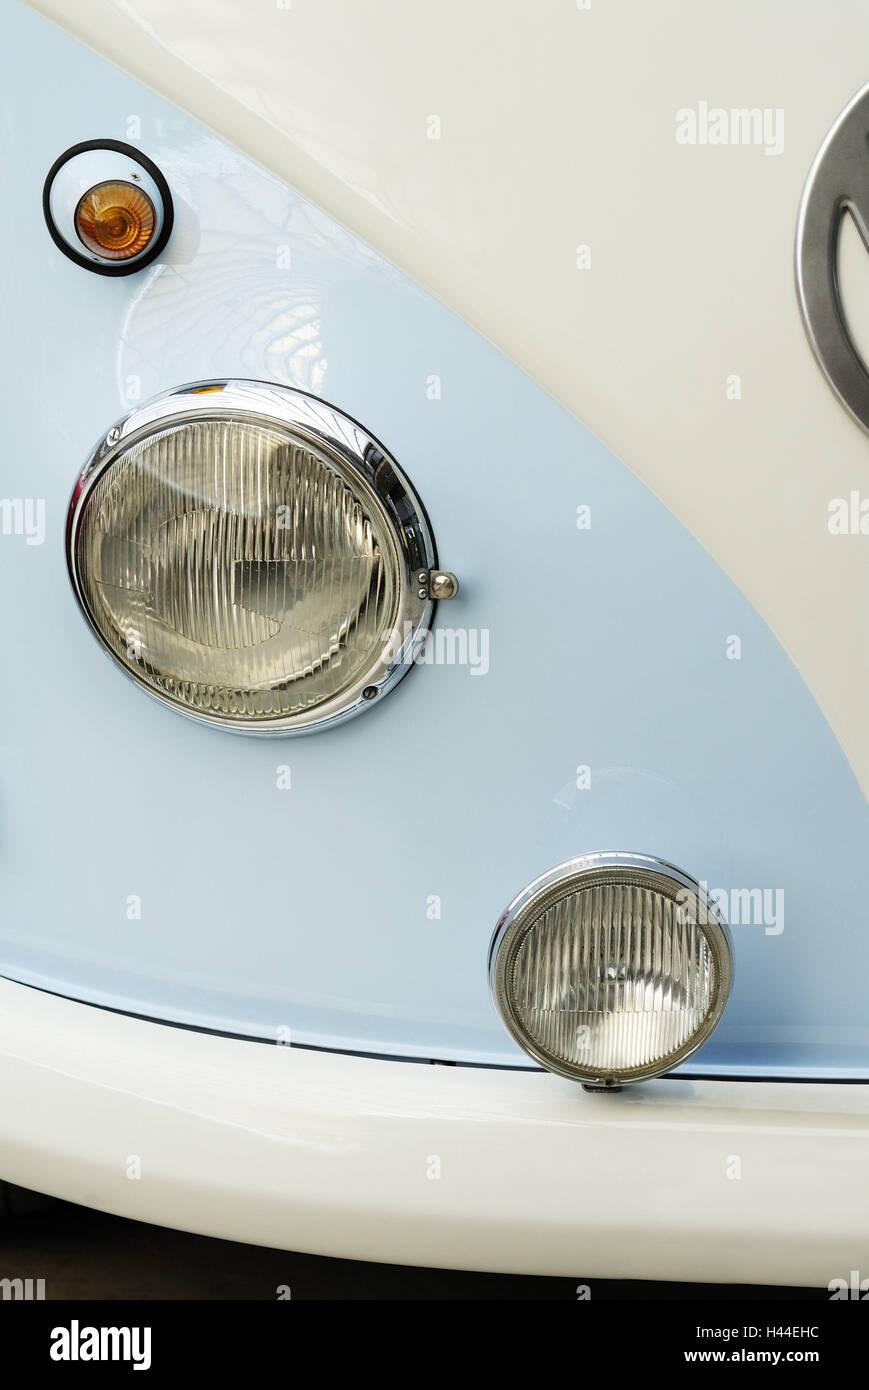 Vintage car, VW, transporter, bumper, headlight, indicator